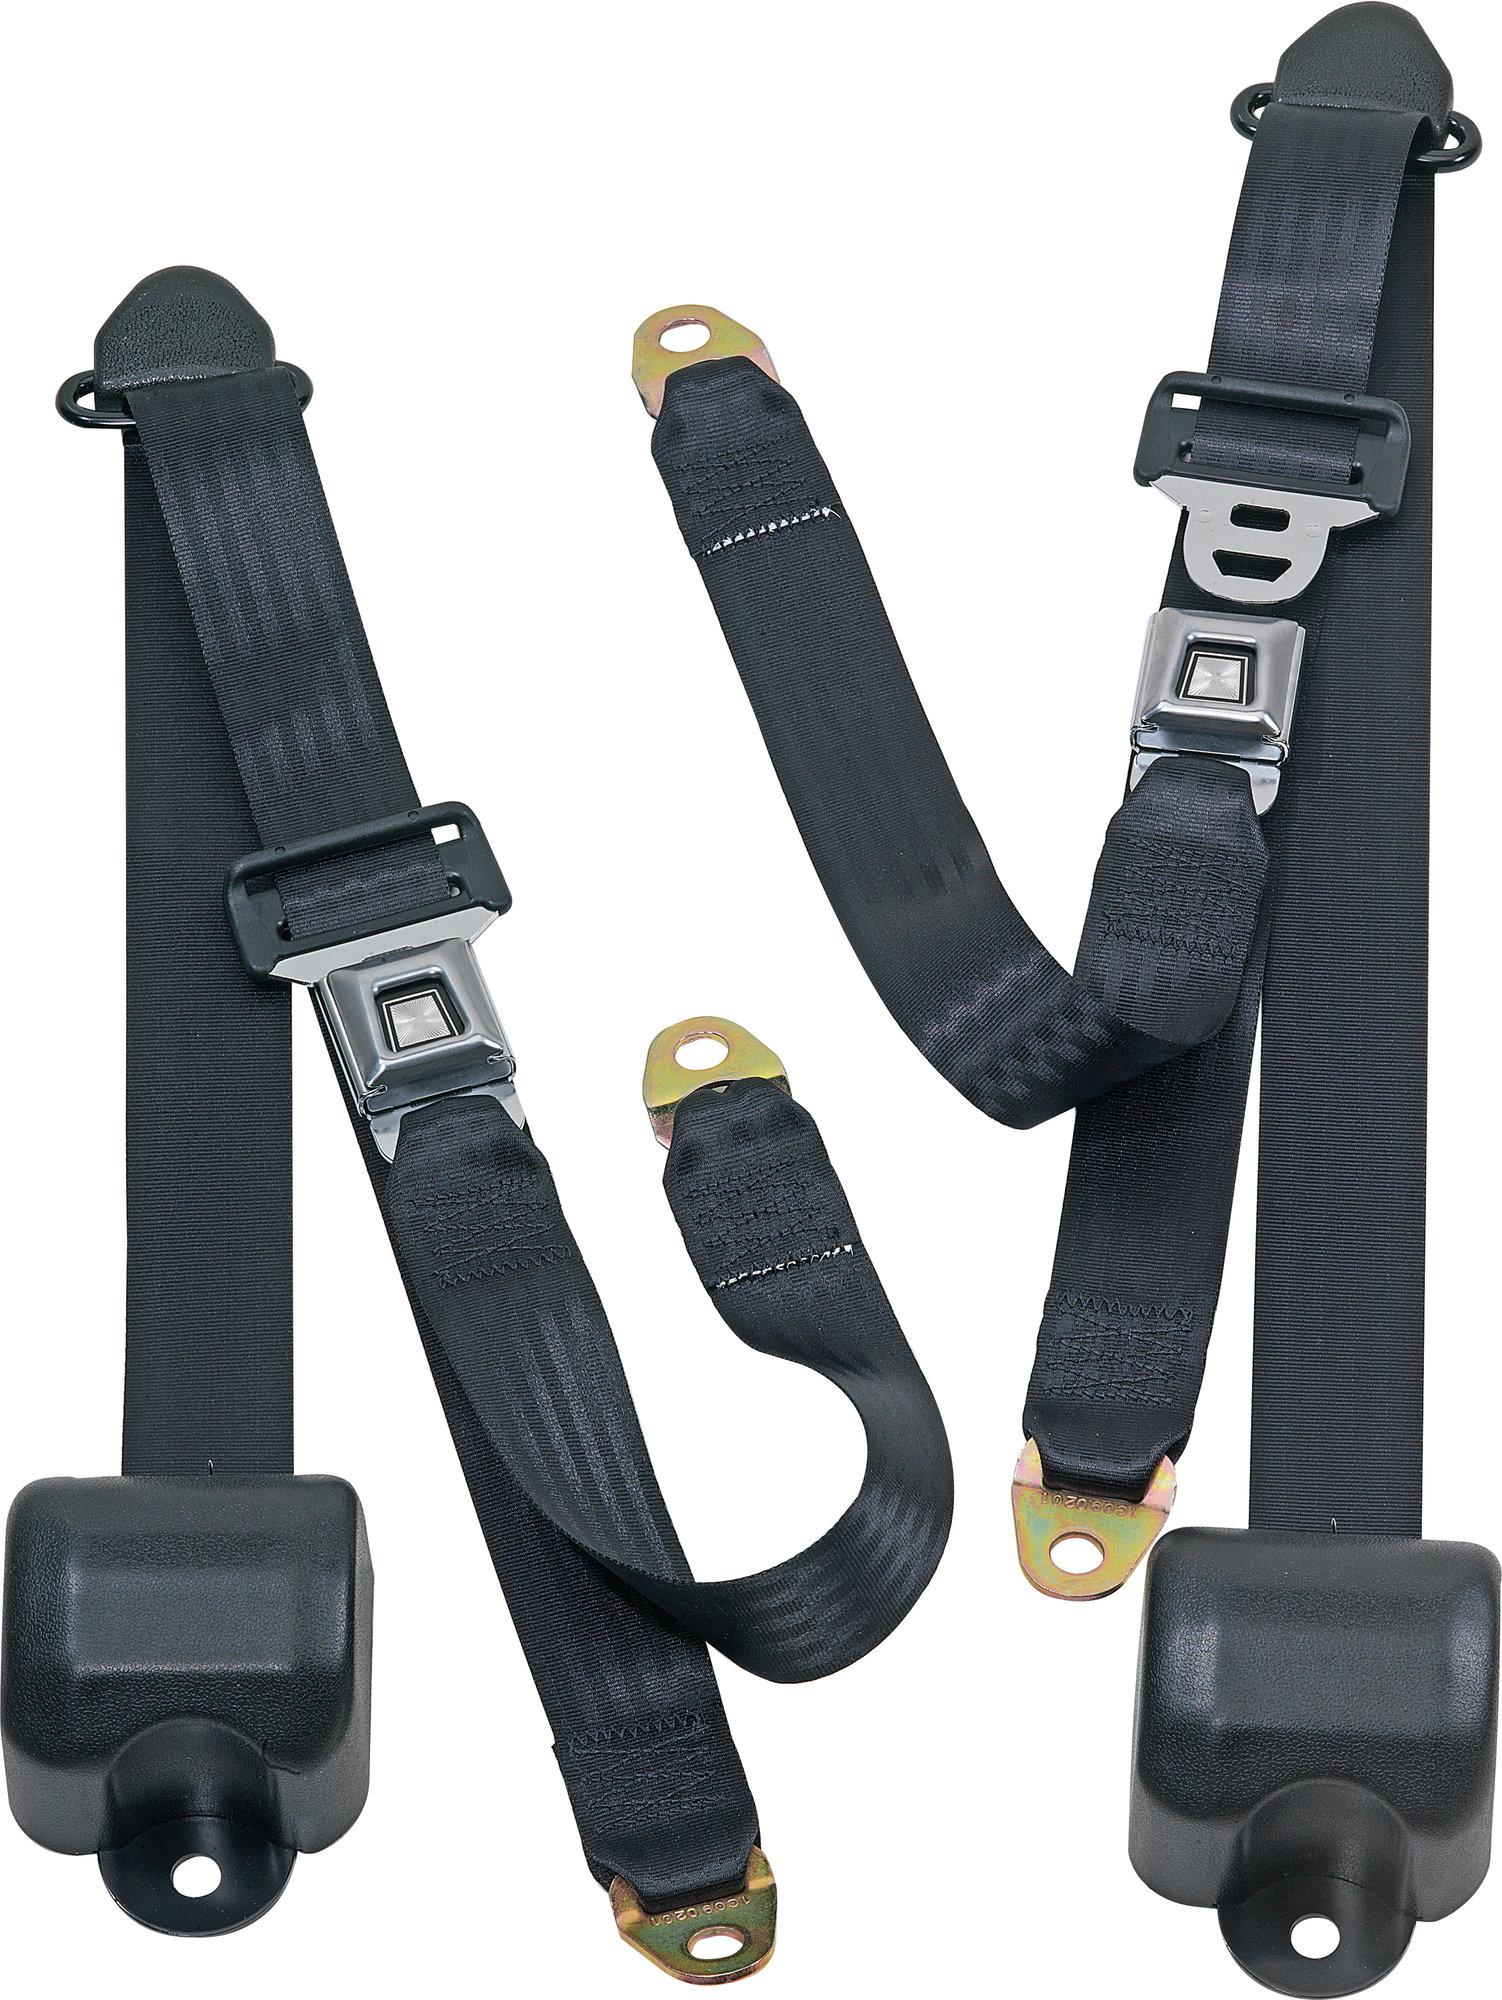 hight resolution of seatbelt solutions front metal push button 3 point retractable belts for 82 91 jeep cj 5 cj 7 cj 8 scrambler wrangler yj